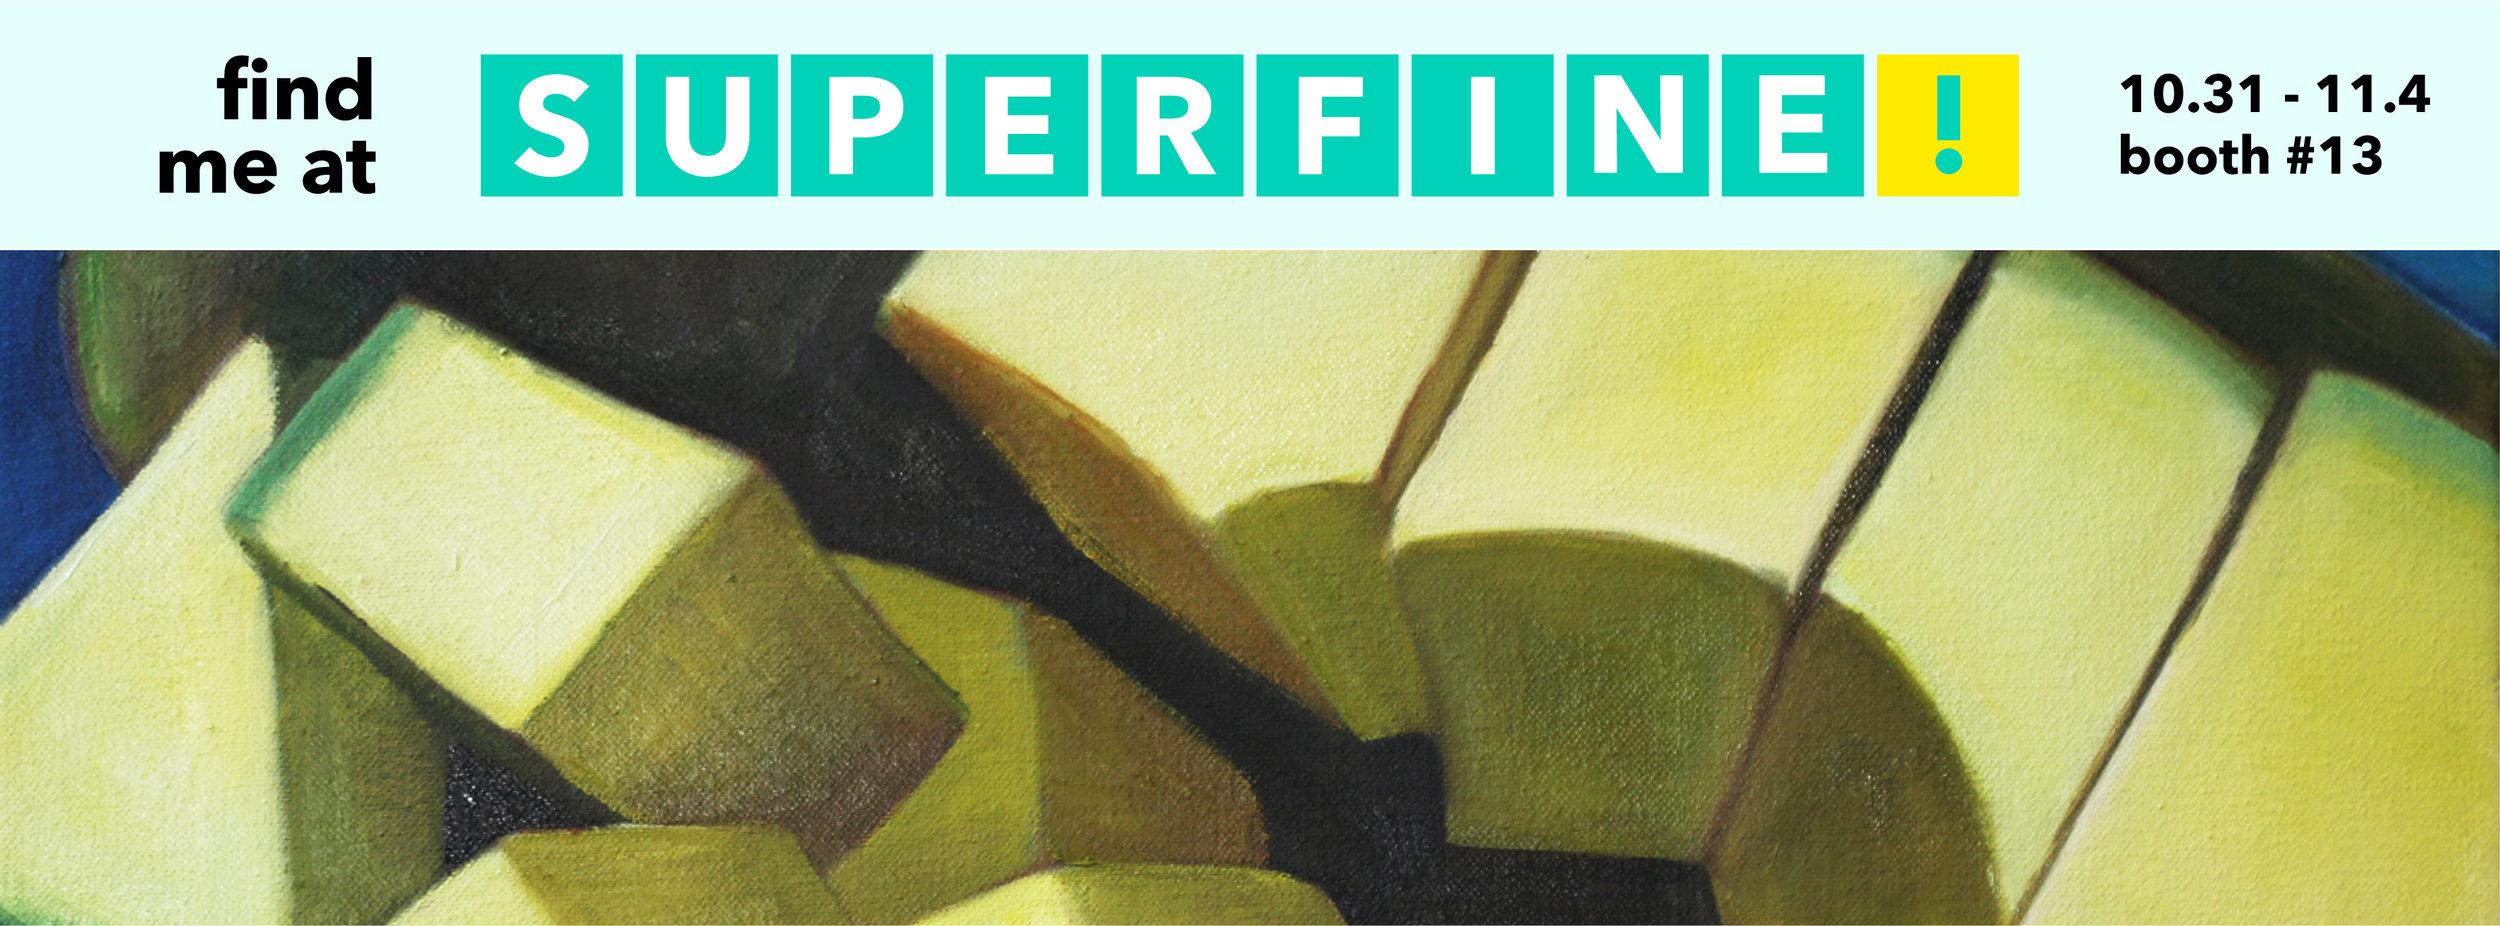 Superfine! DC Exhibitor Horizontal Graphic-62.jpg